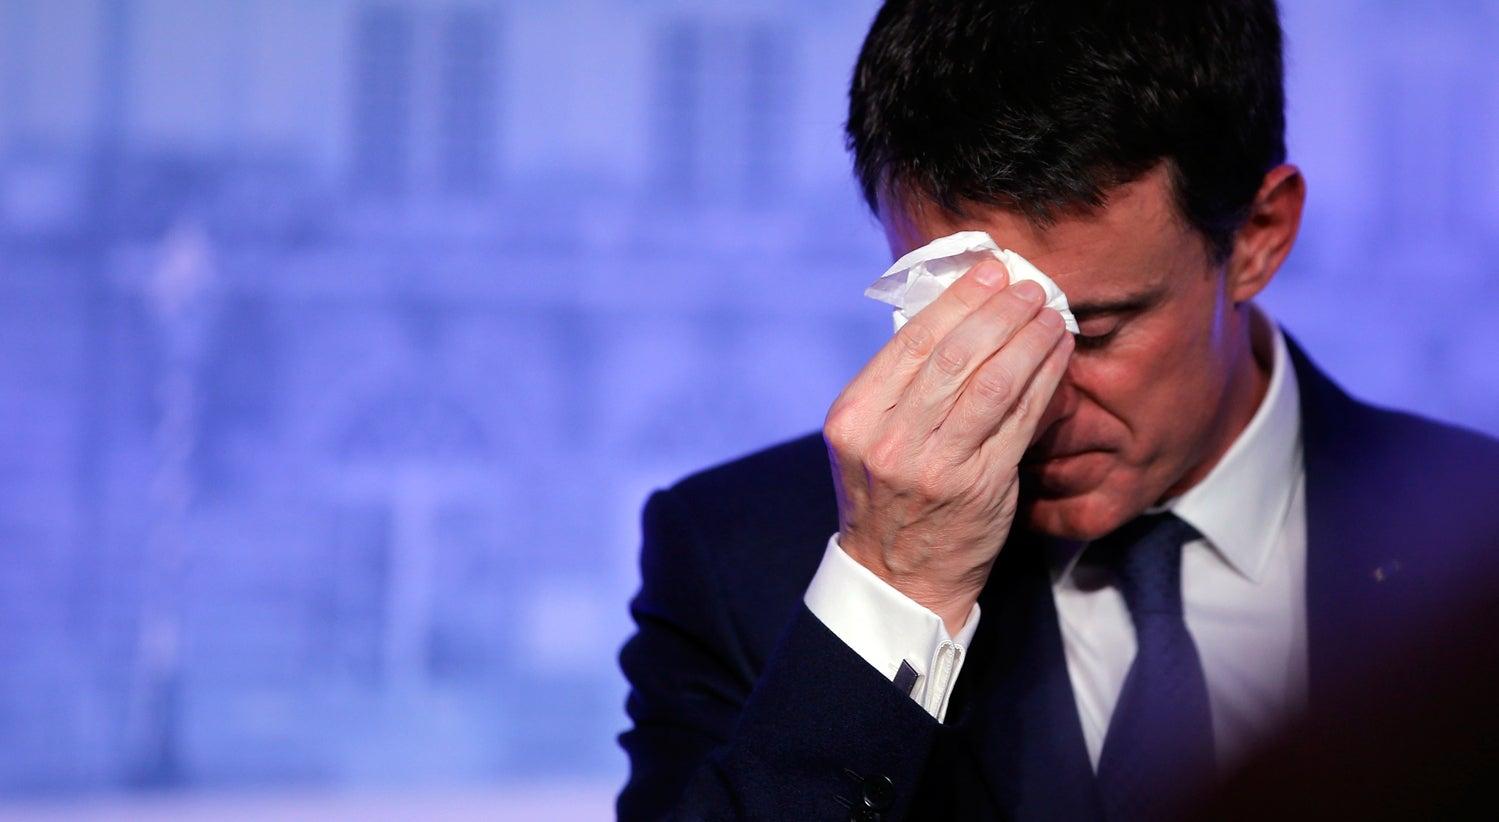 Mundo - Valls prepara-se para anunciar candidatura ao Eliseu